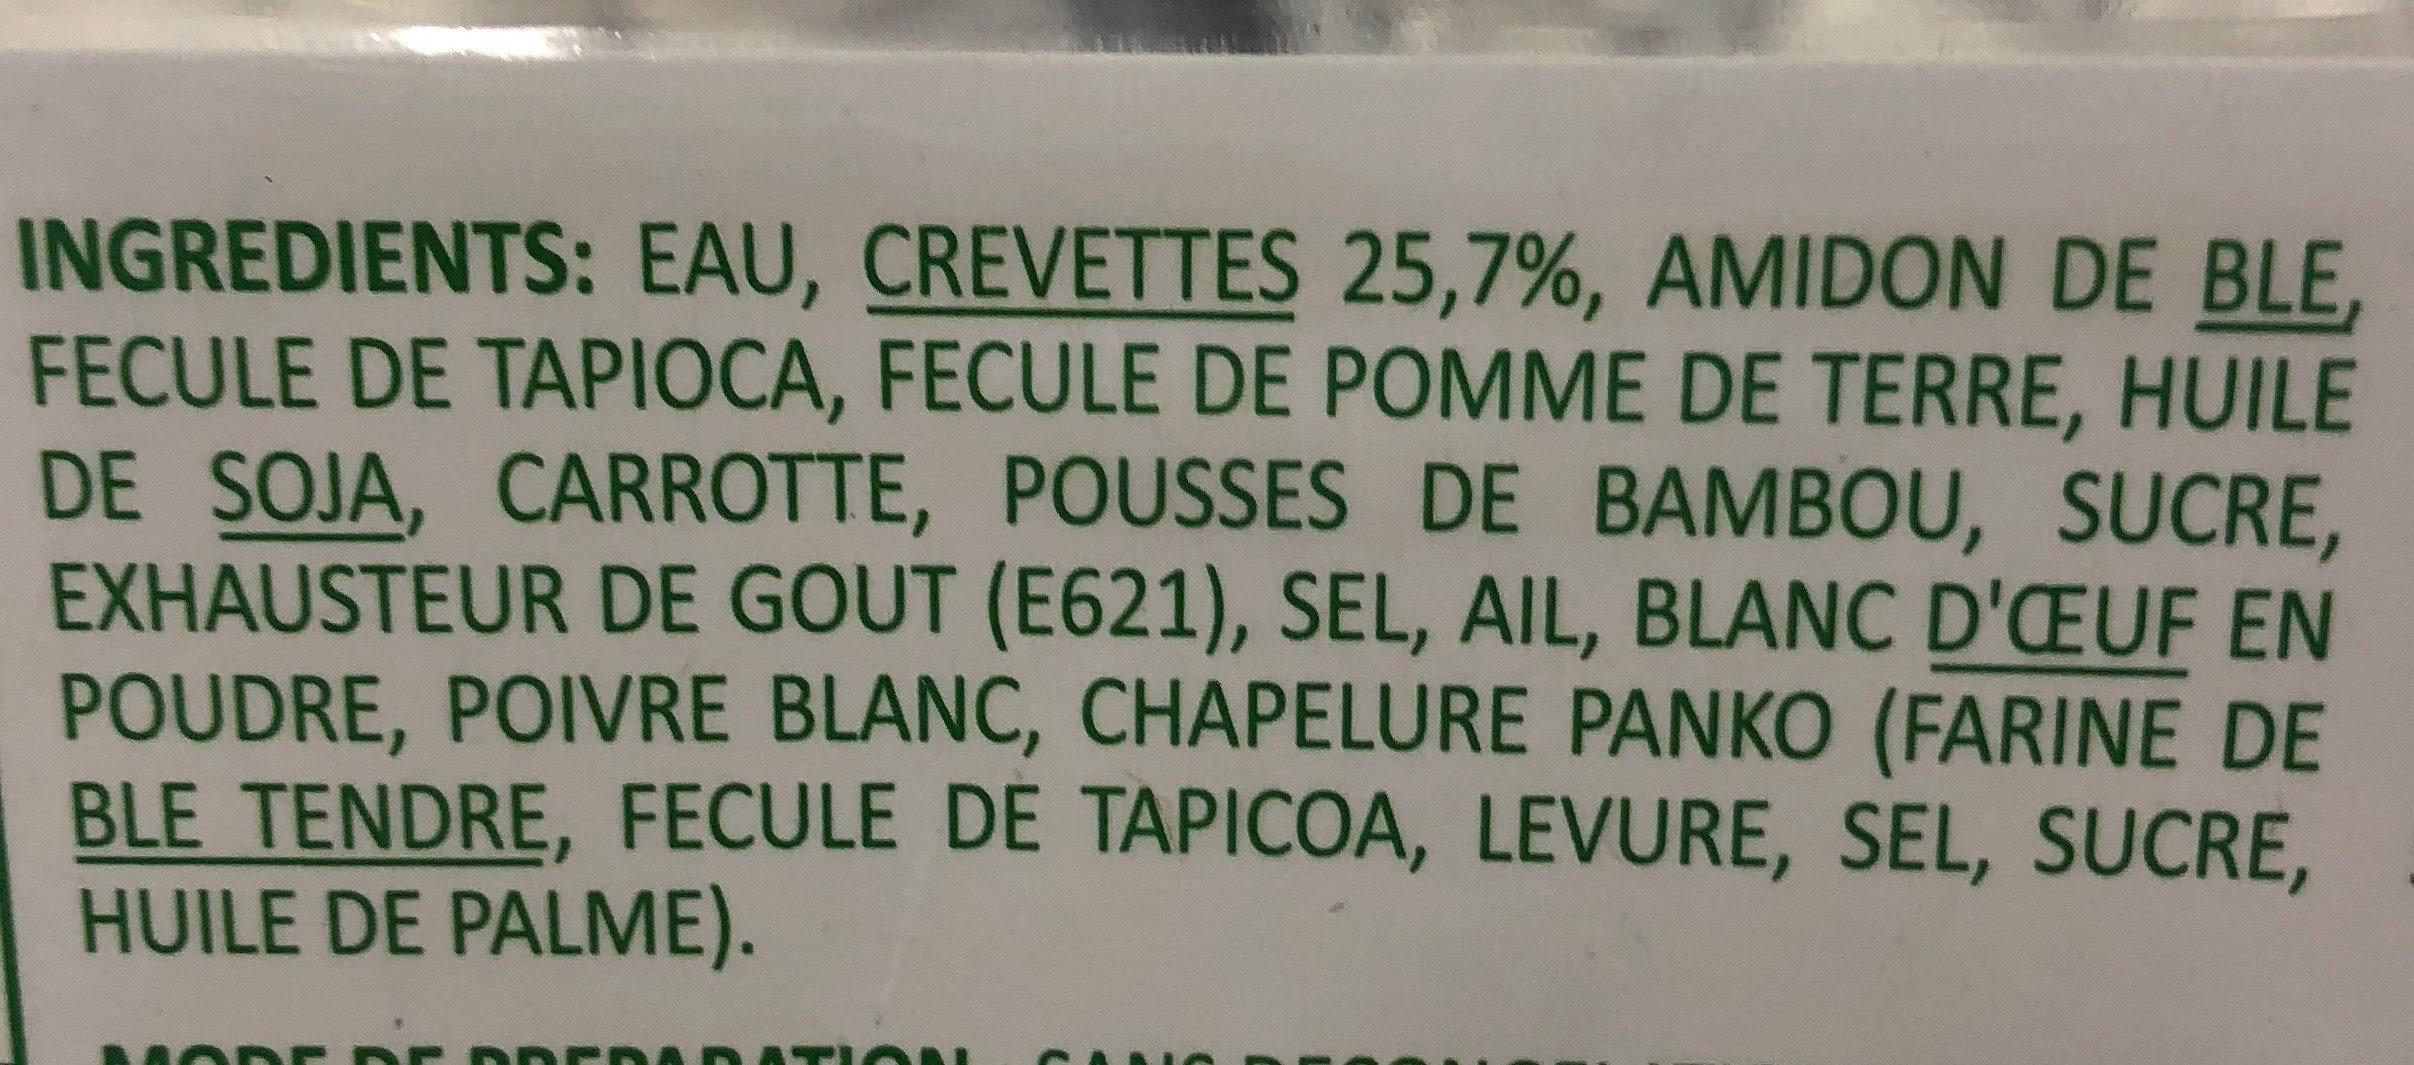 Ravioli aux crevettes - Ingredients - fr